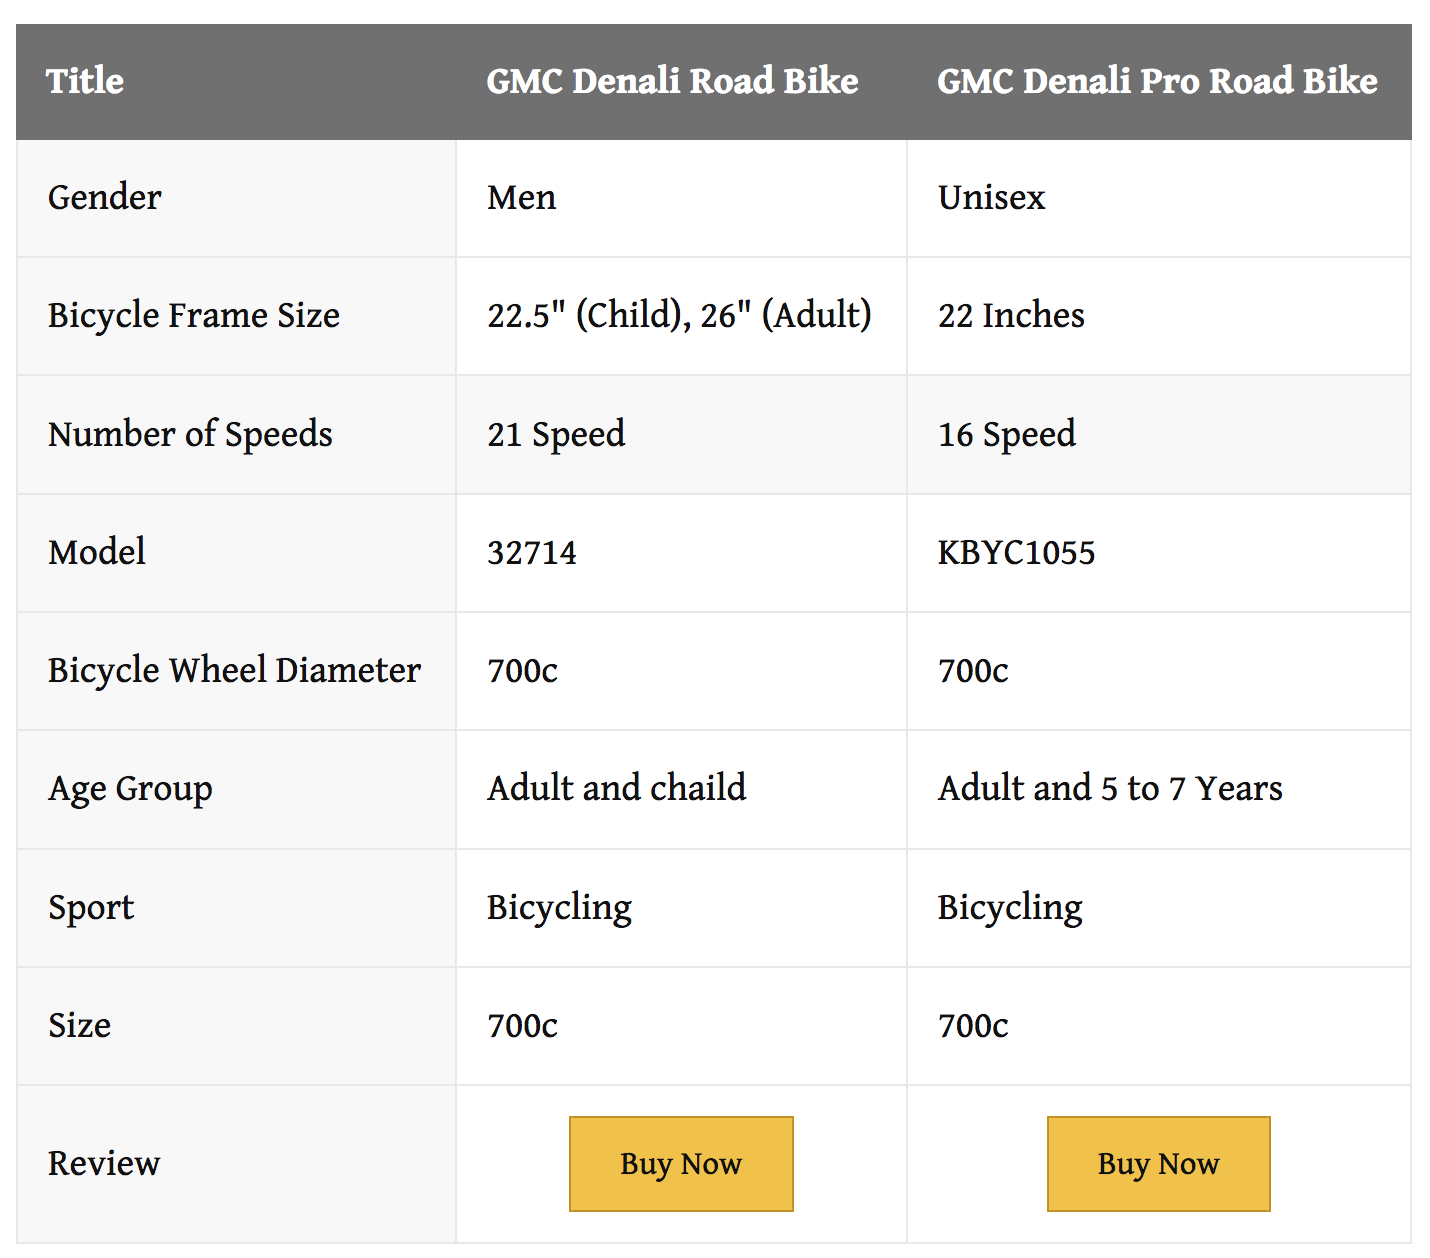 Gmc Denali Road Bike Vs Gmc Denali Pro Road Bike Which Should